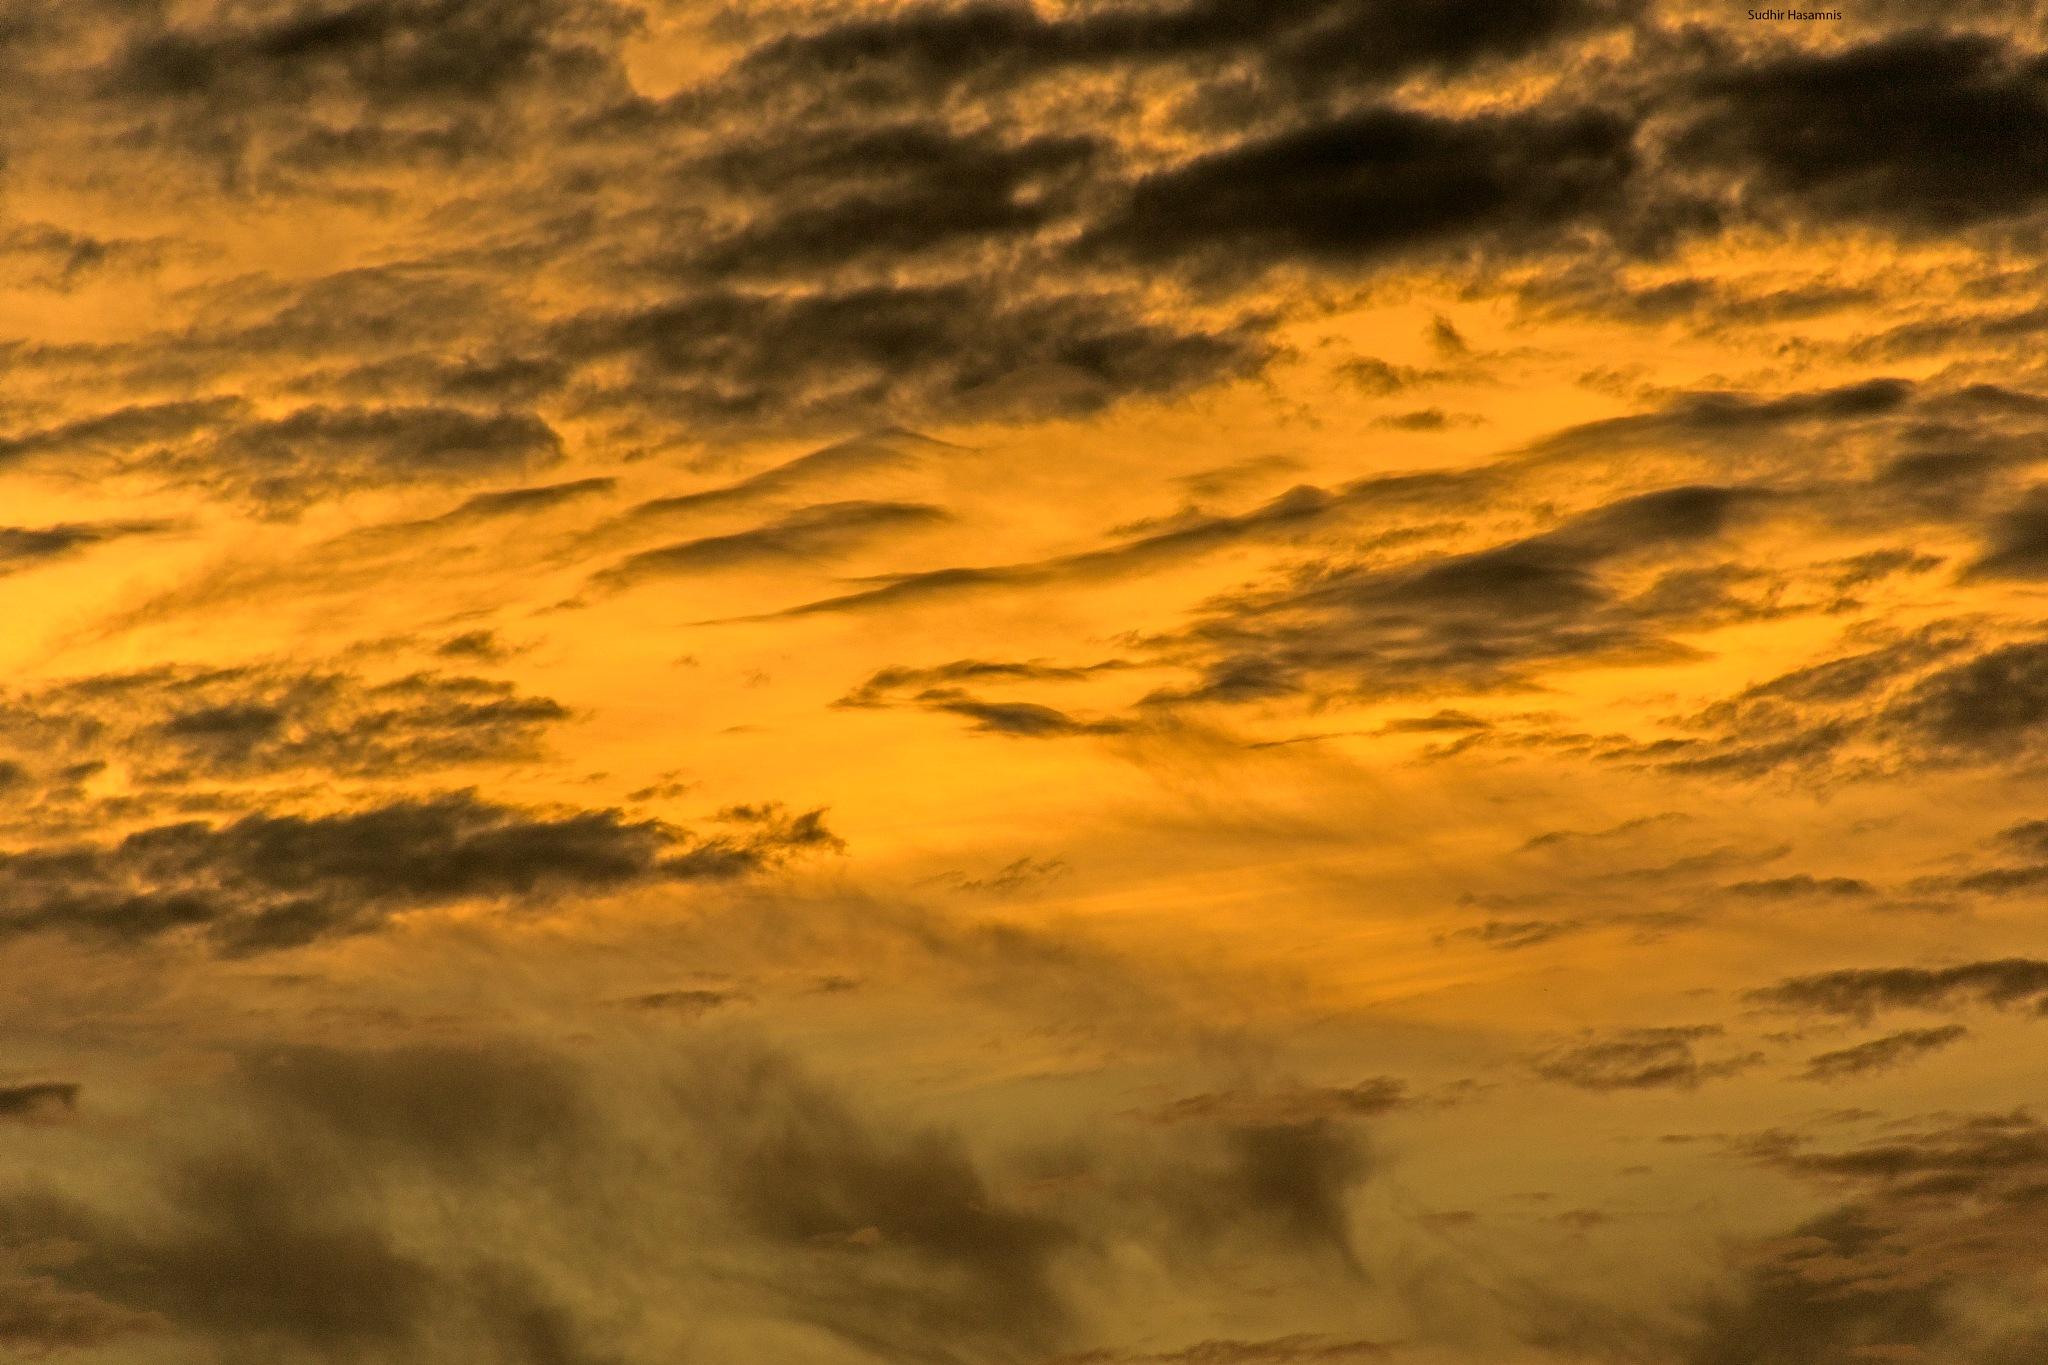 Yellow turmoil by DrSudhir Hasamnis